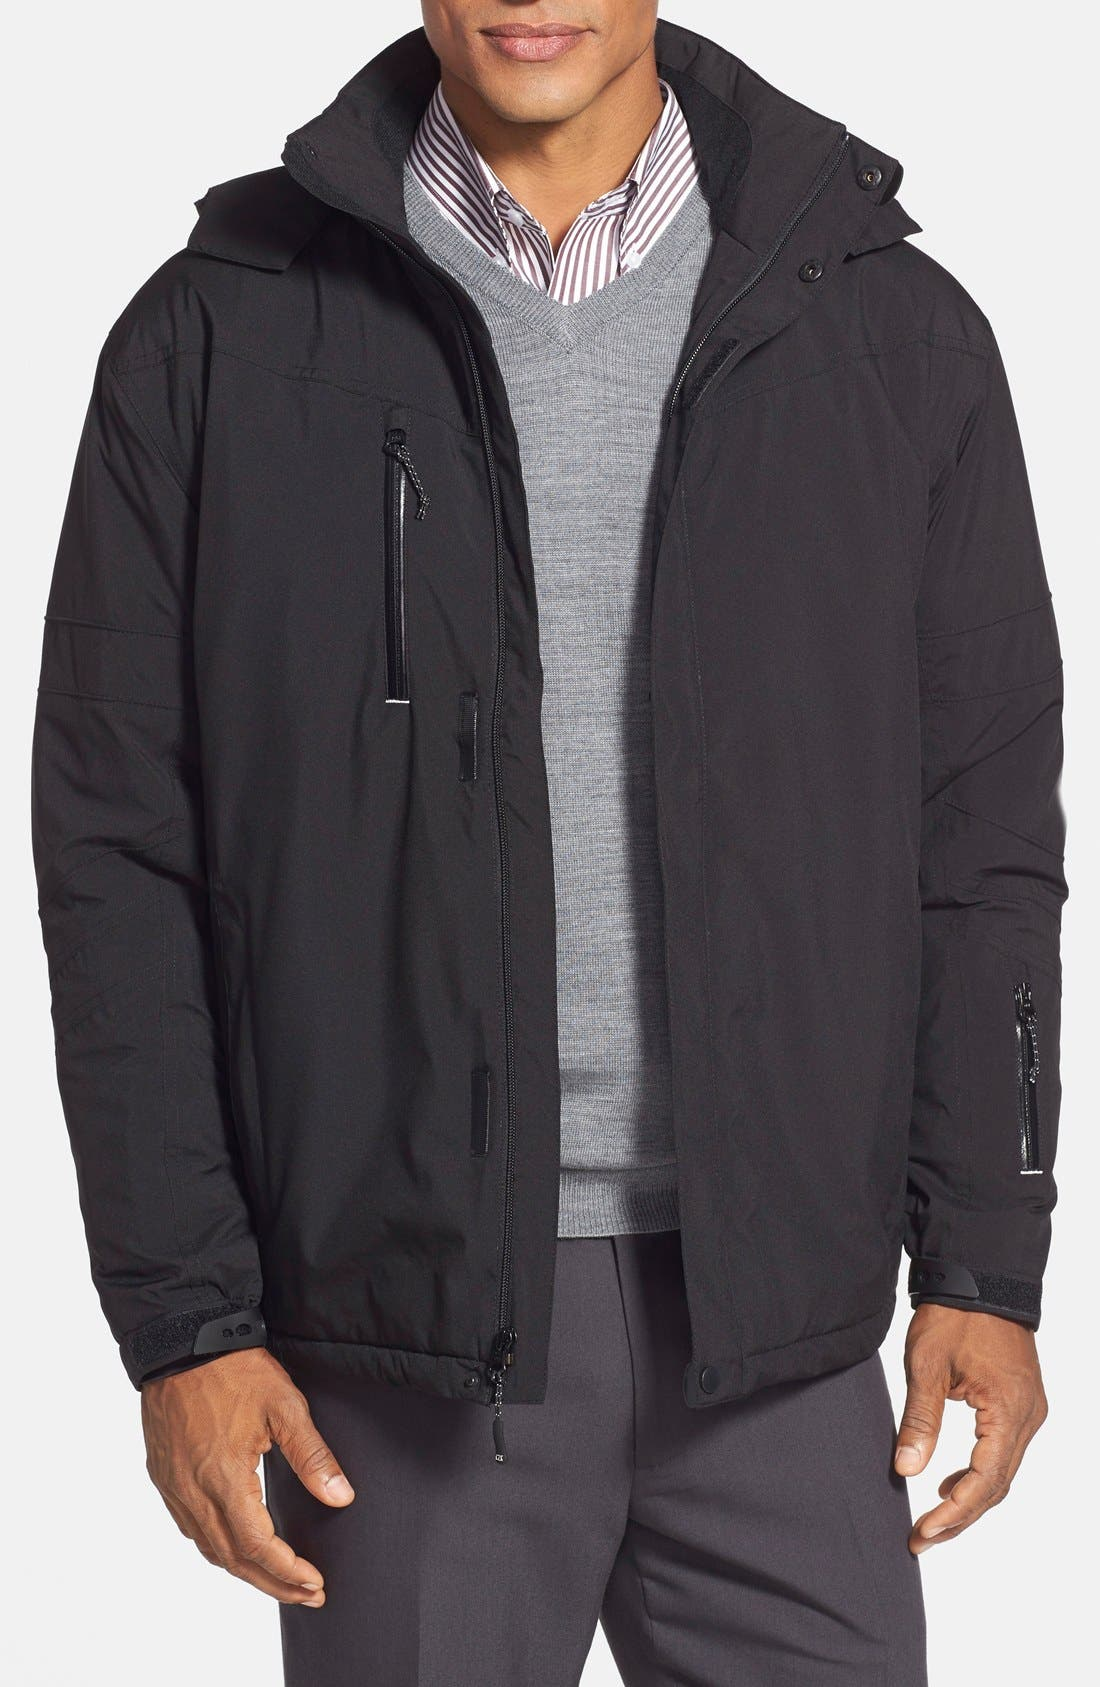 Main Image - Cutter & Buck 'WeatherTec Sanders' Jacket (Online Only)